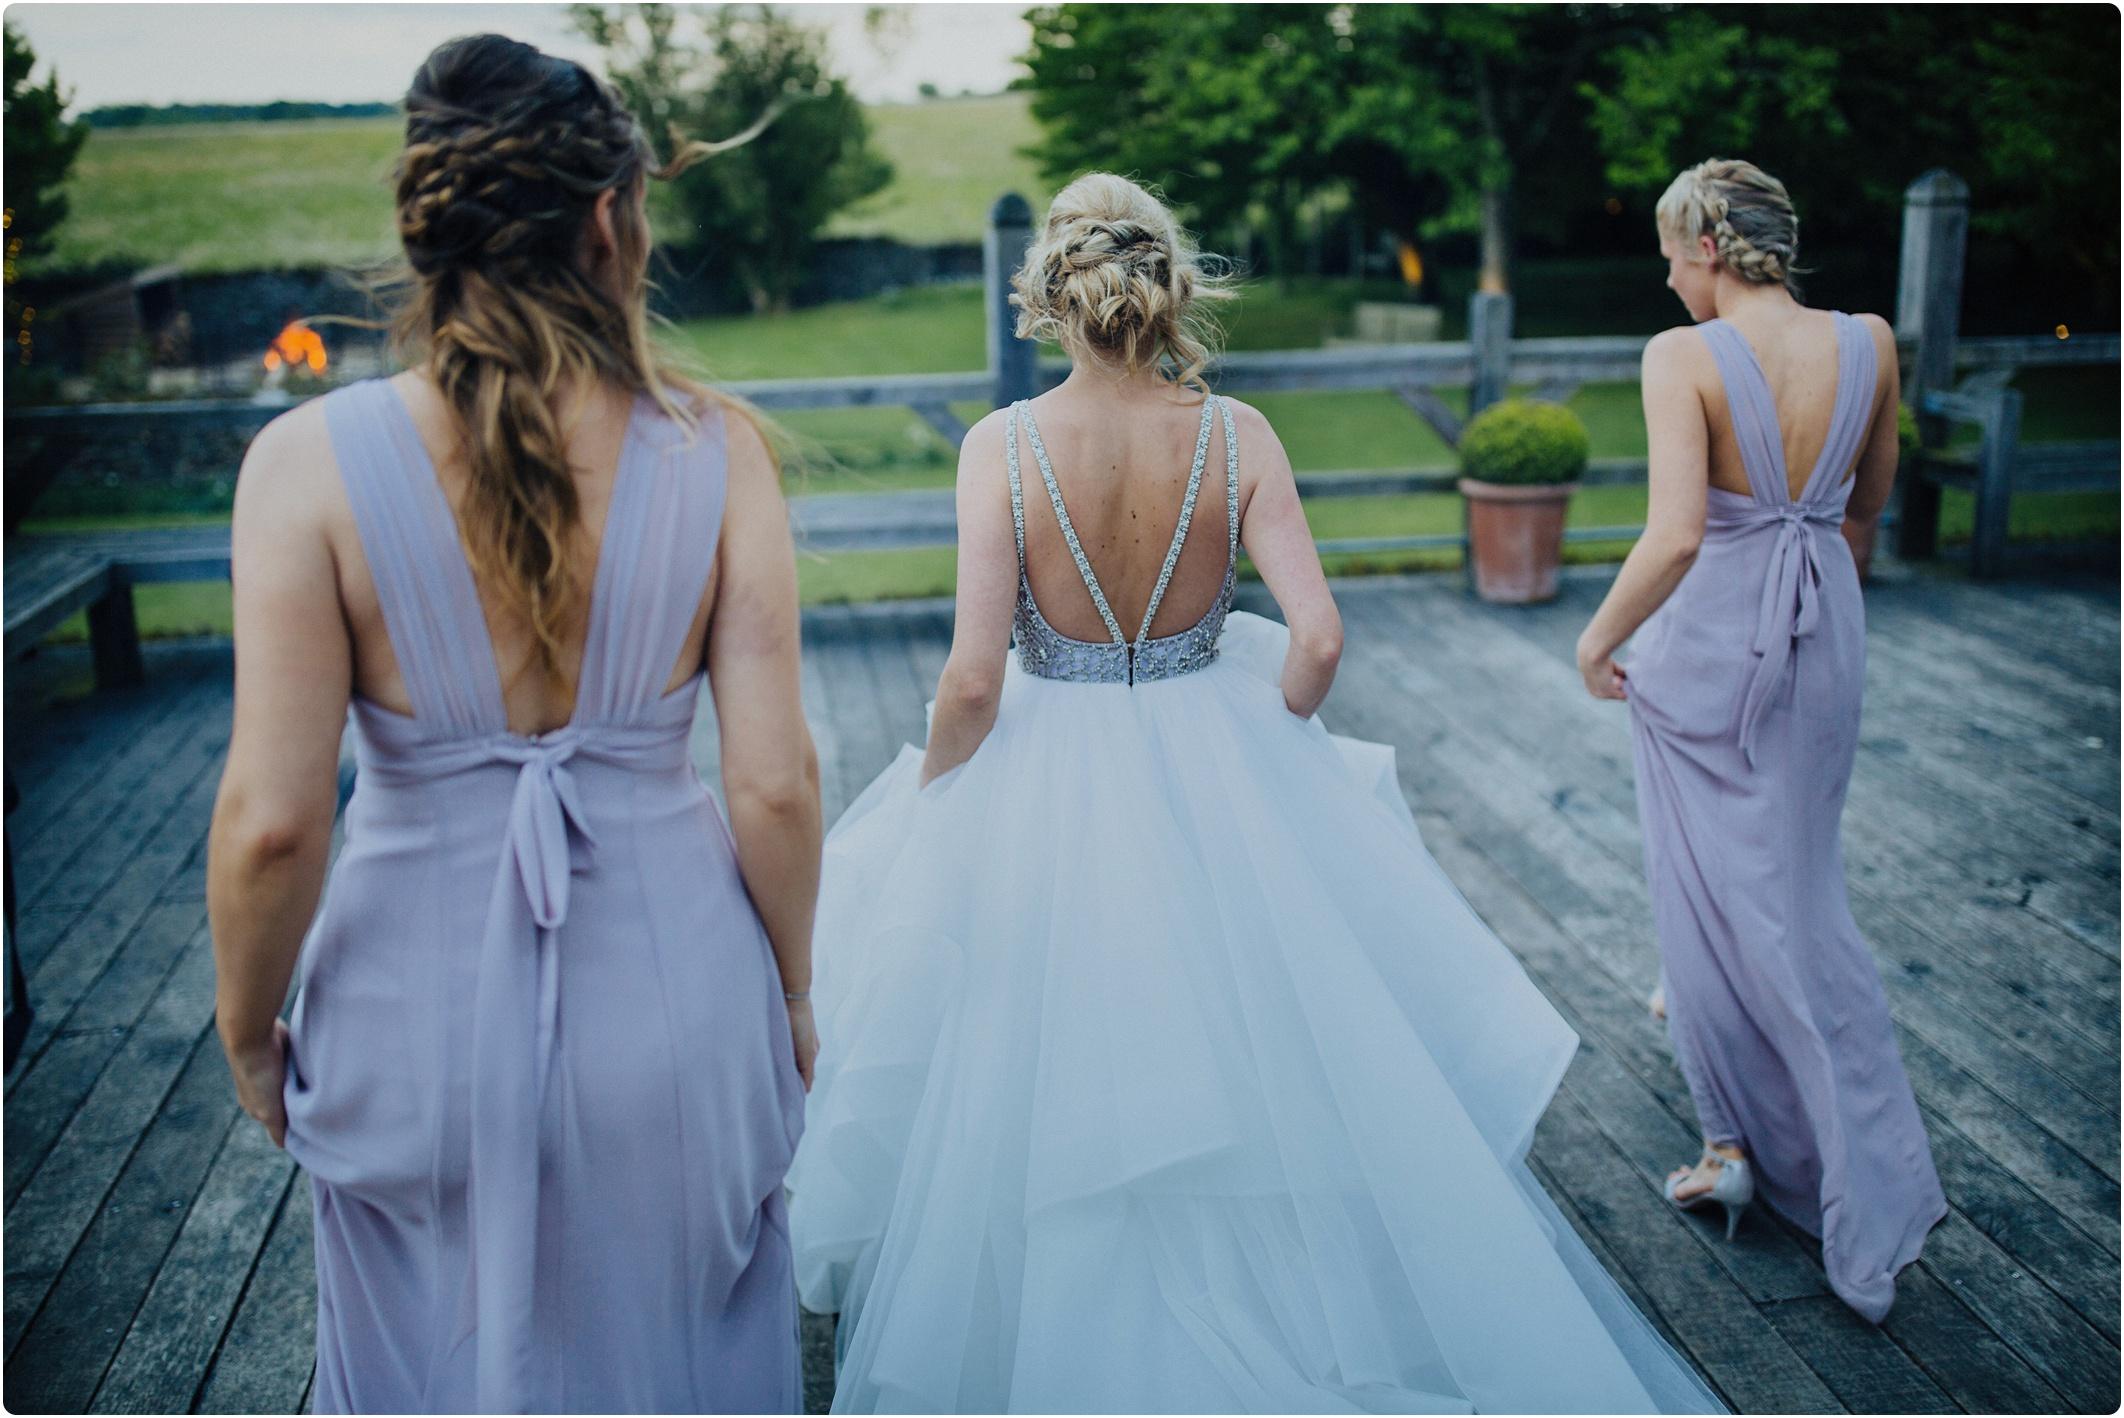 Cripps Barn bride and bridesmaids